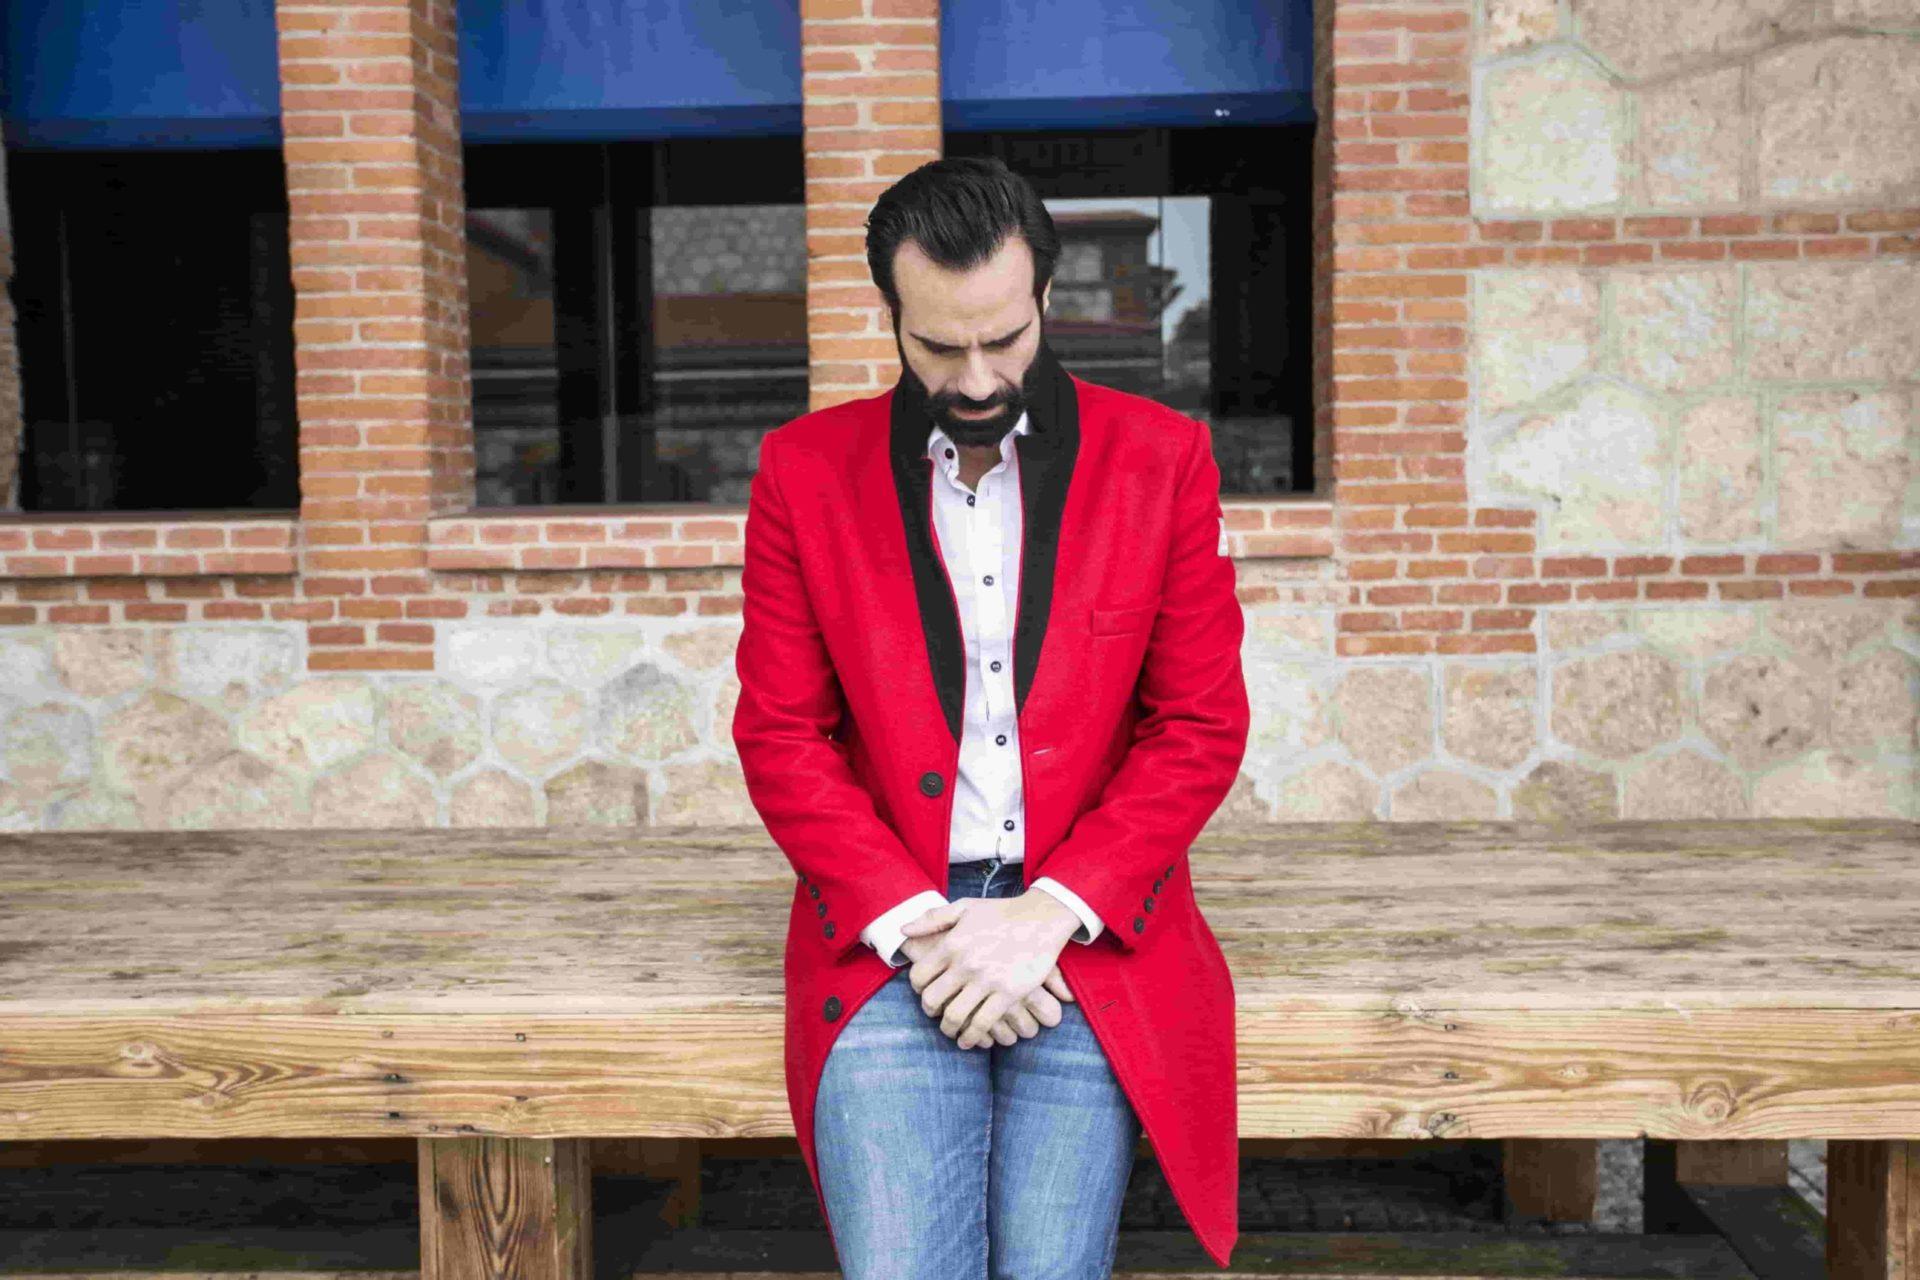 Cómo combinar un abrigo rojo: trucos que no fallan